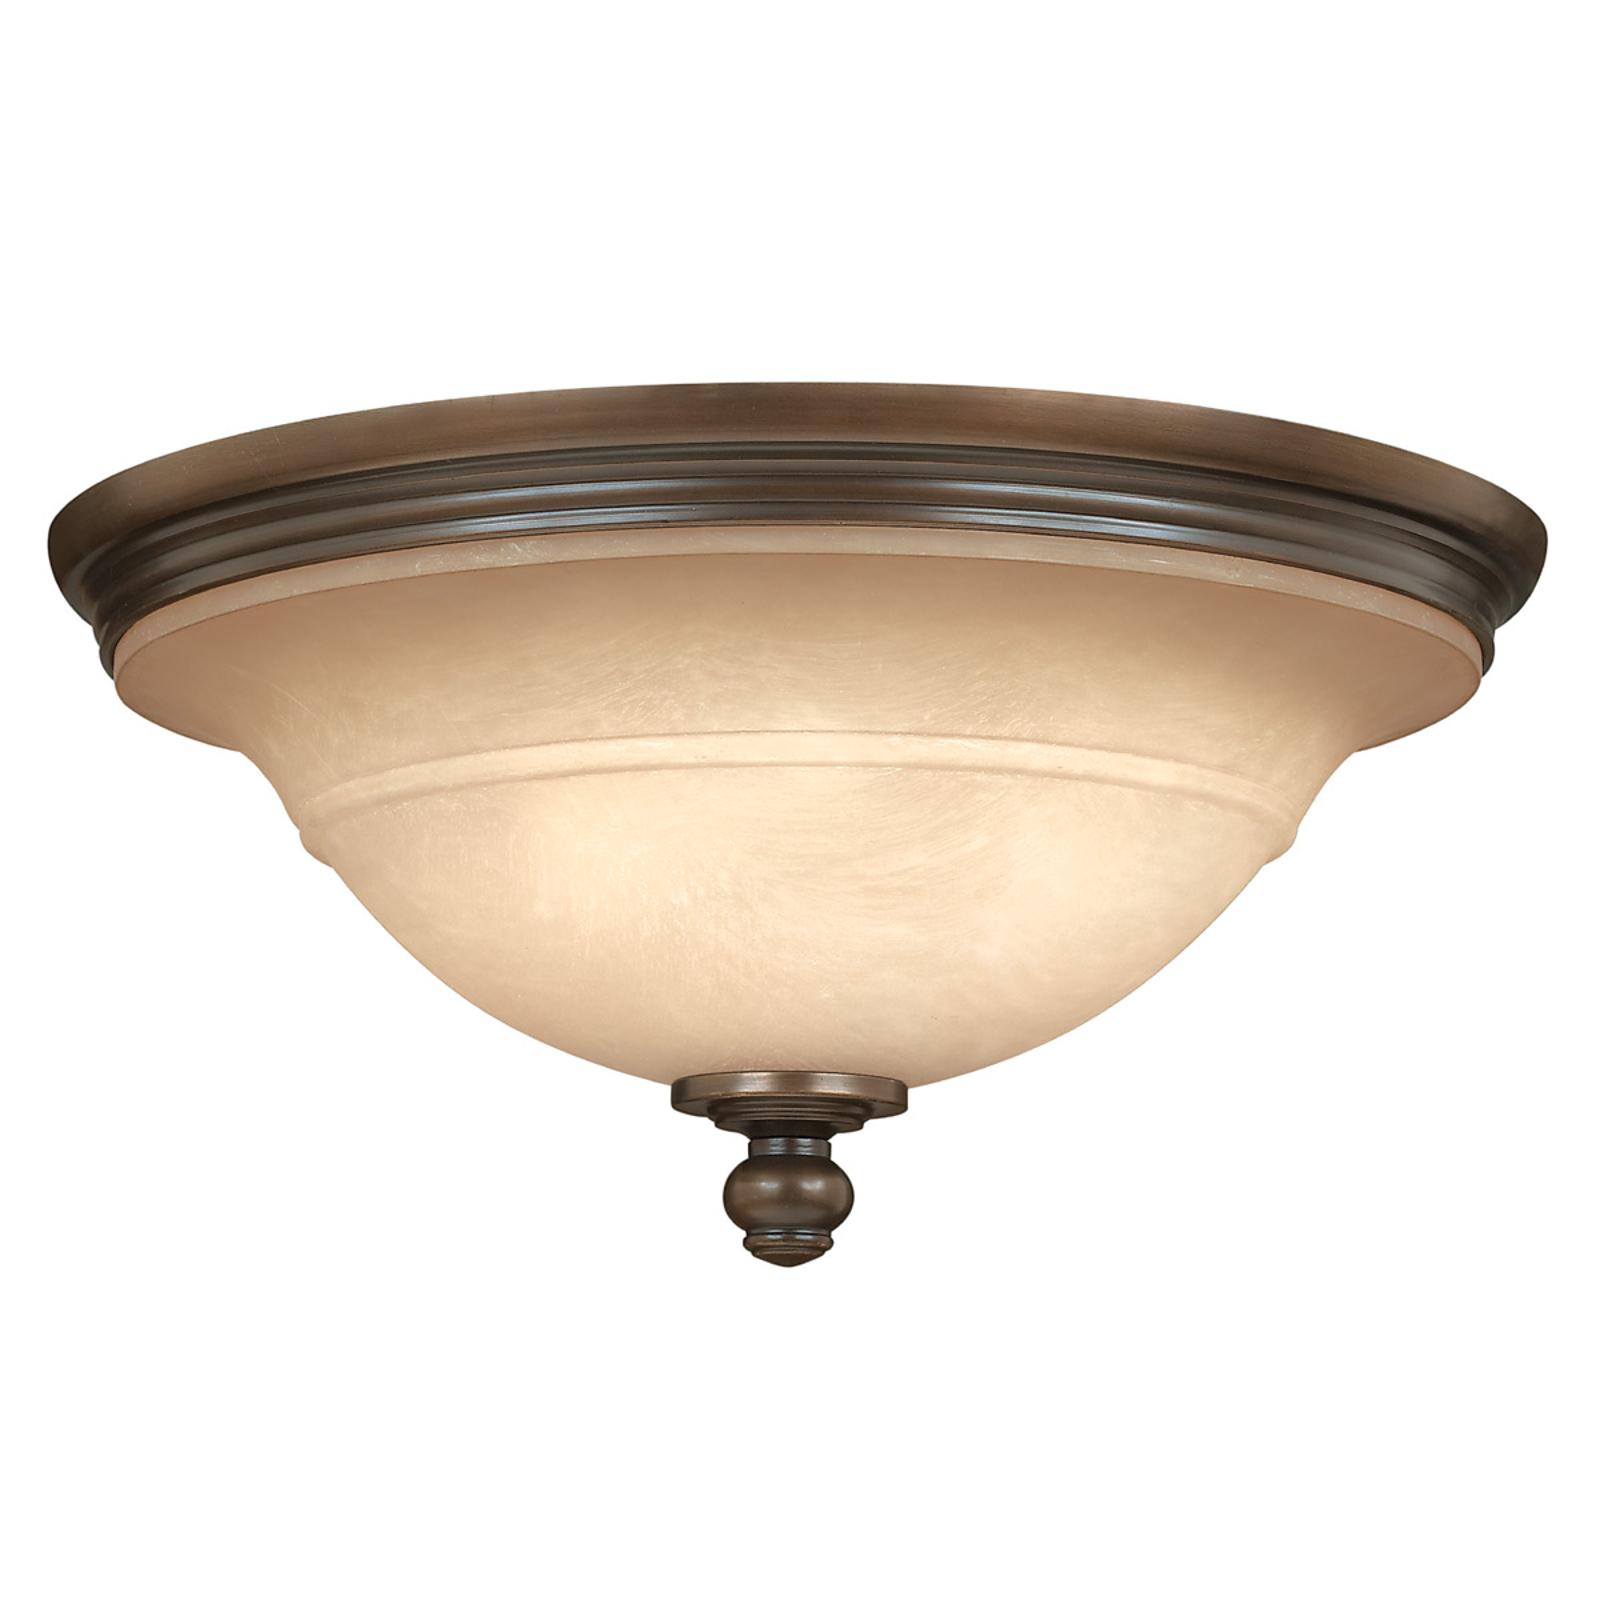 Rustik plafondlampa PLYMOUTH